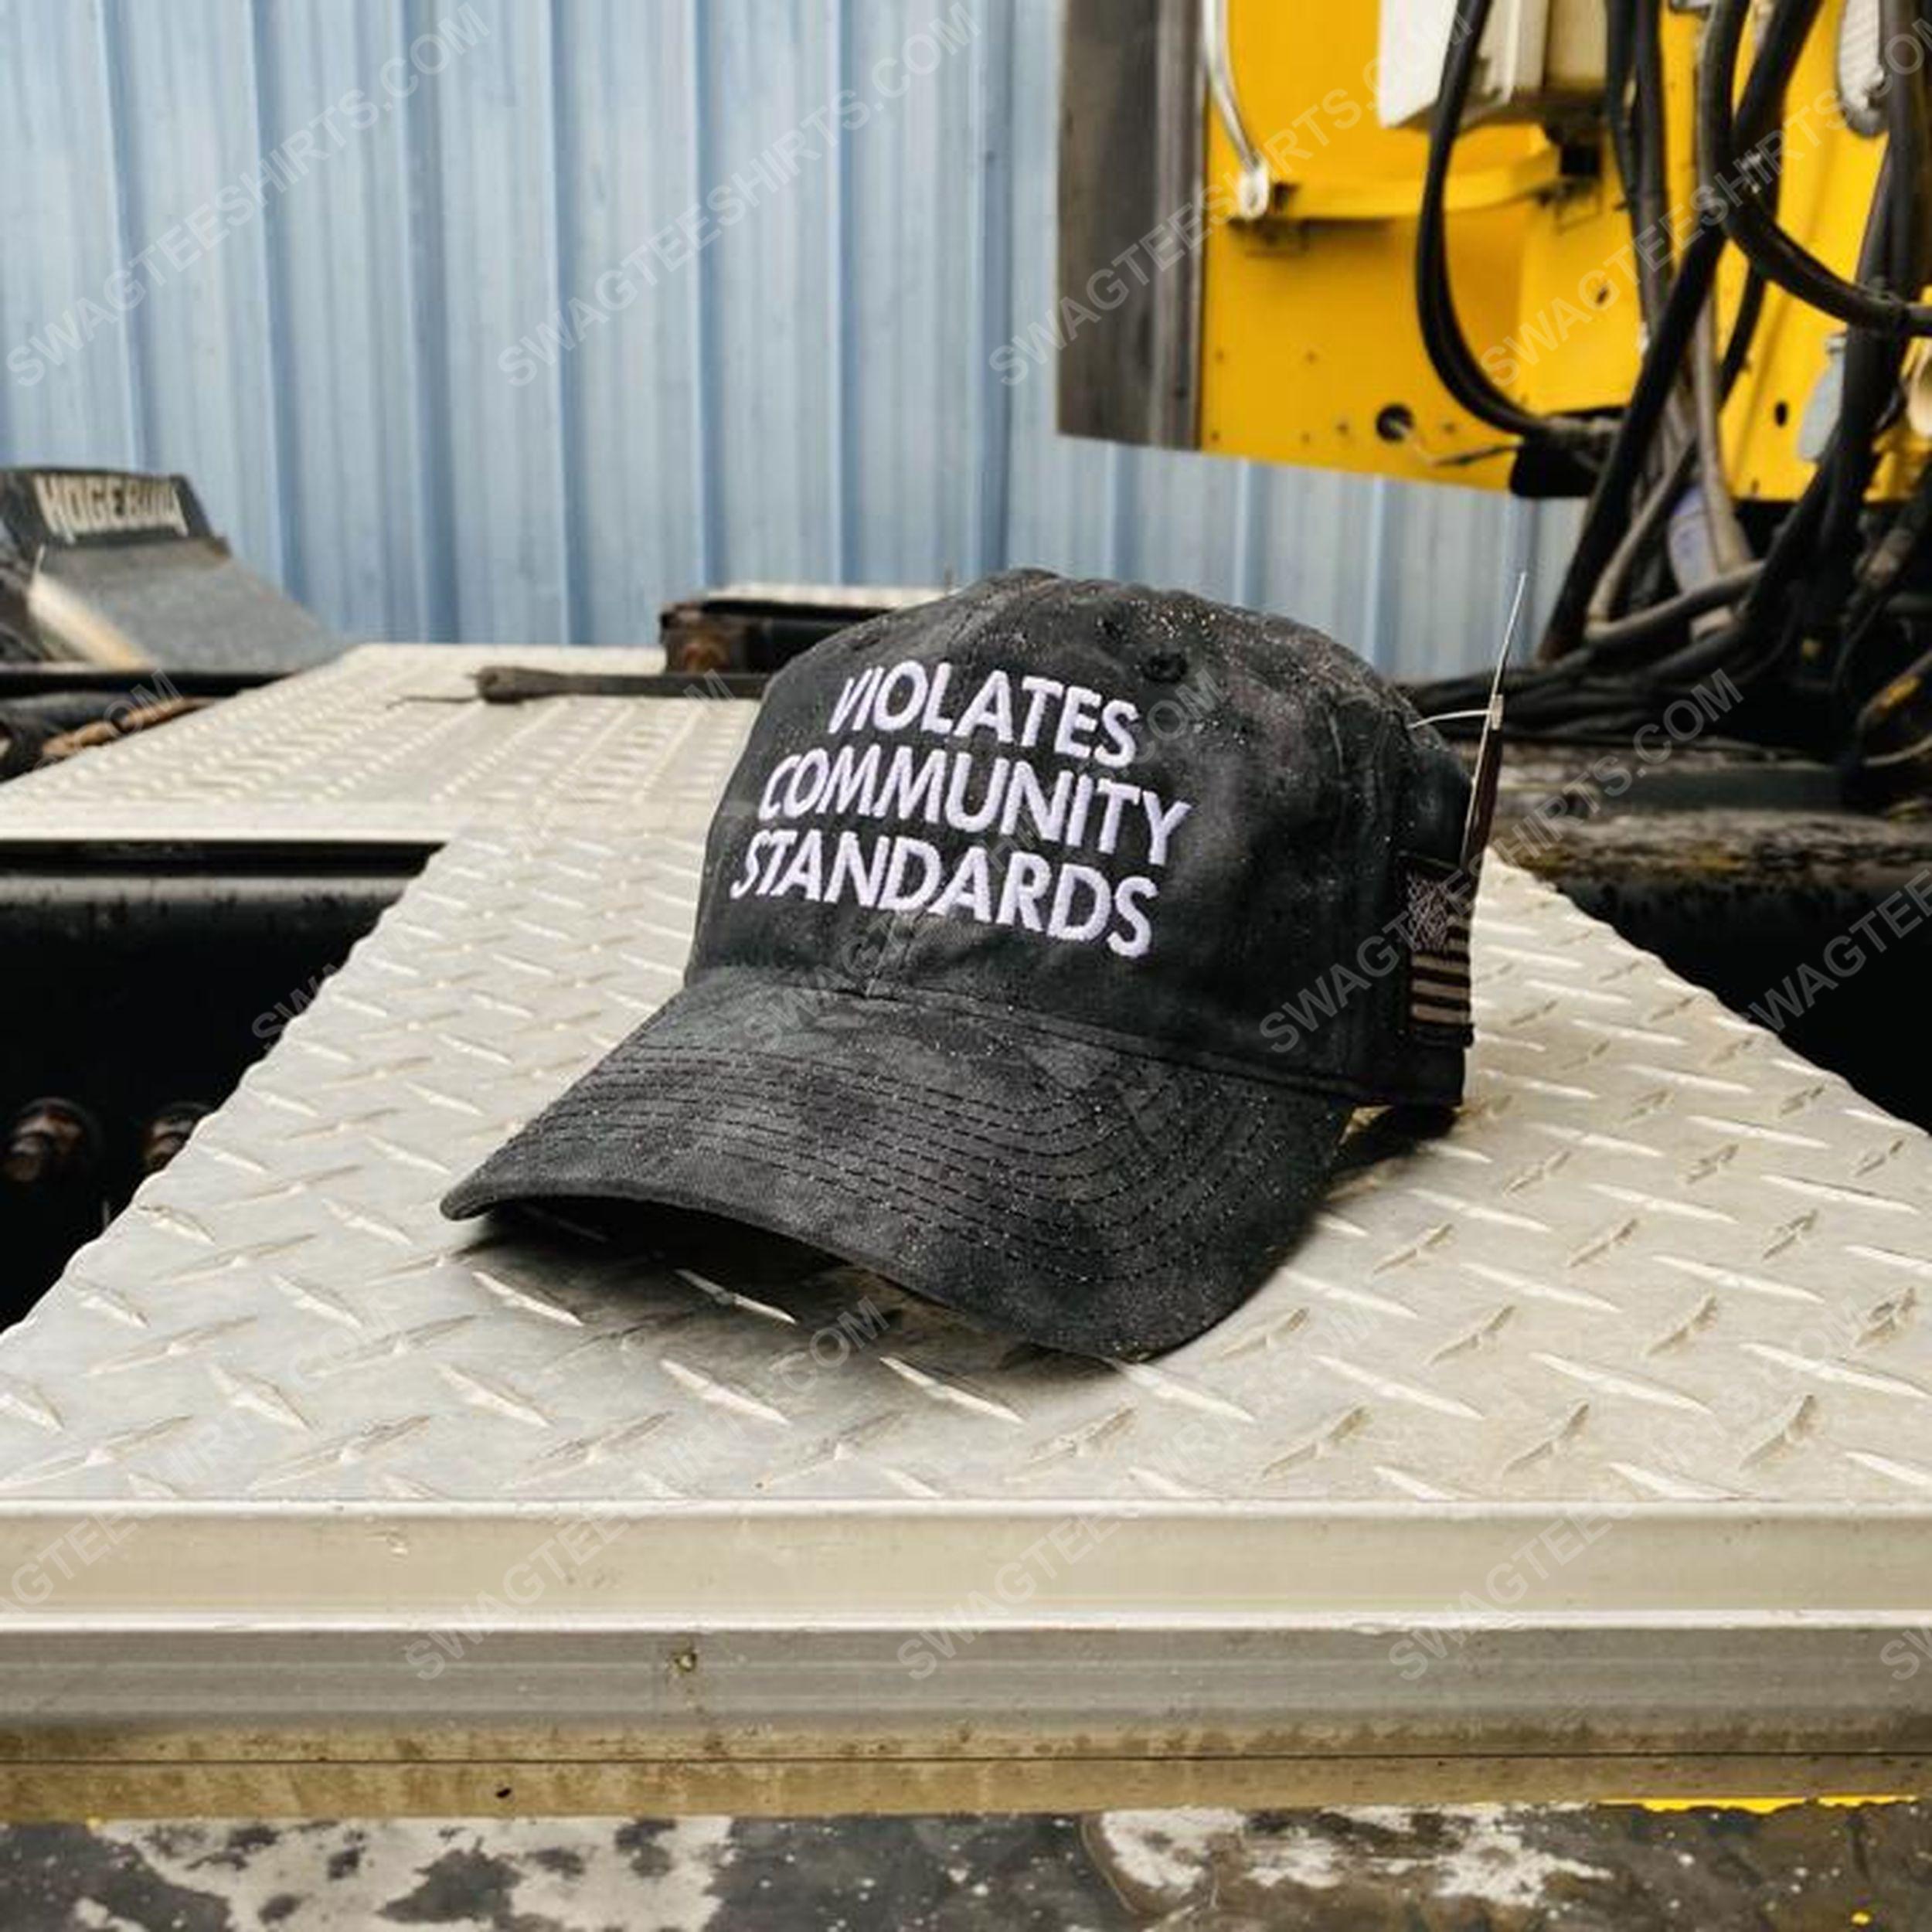 Violates community standards full print classic hat 1 - Copy (2)